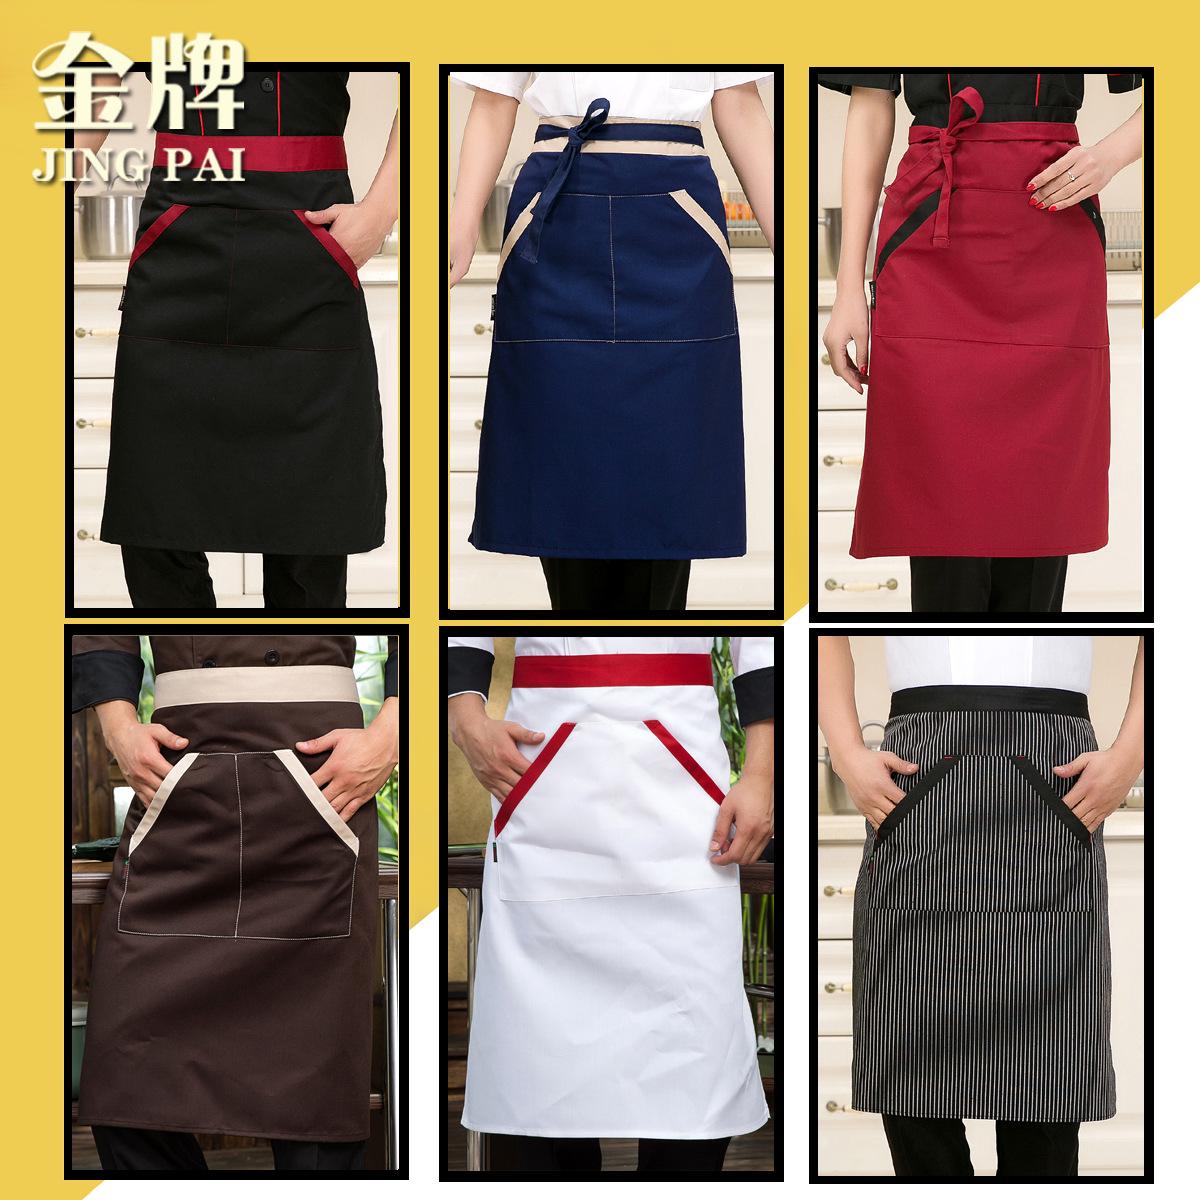 Chef Uniform Limited Sale Cotton Women Aprons 2016 Chef Apron Pwq34(China (Mainland))